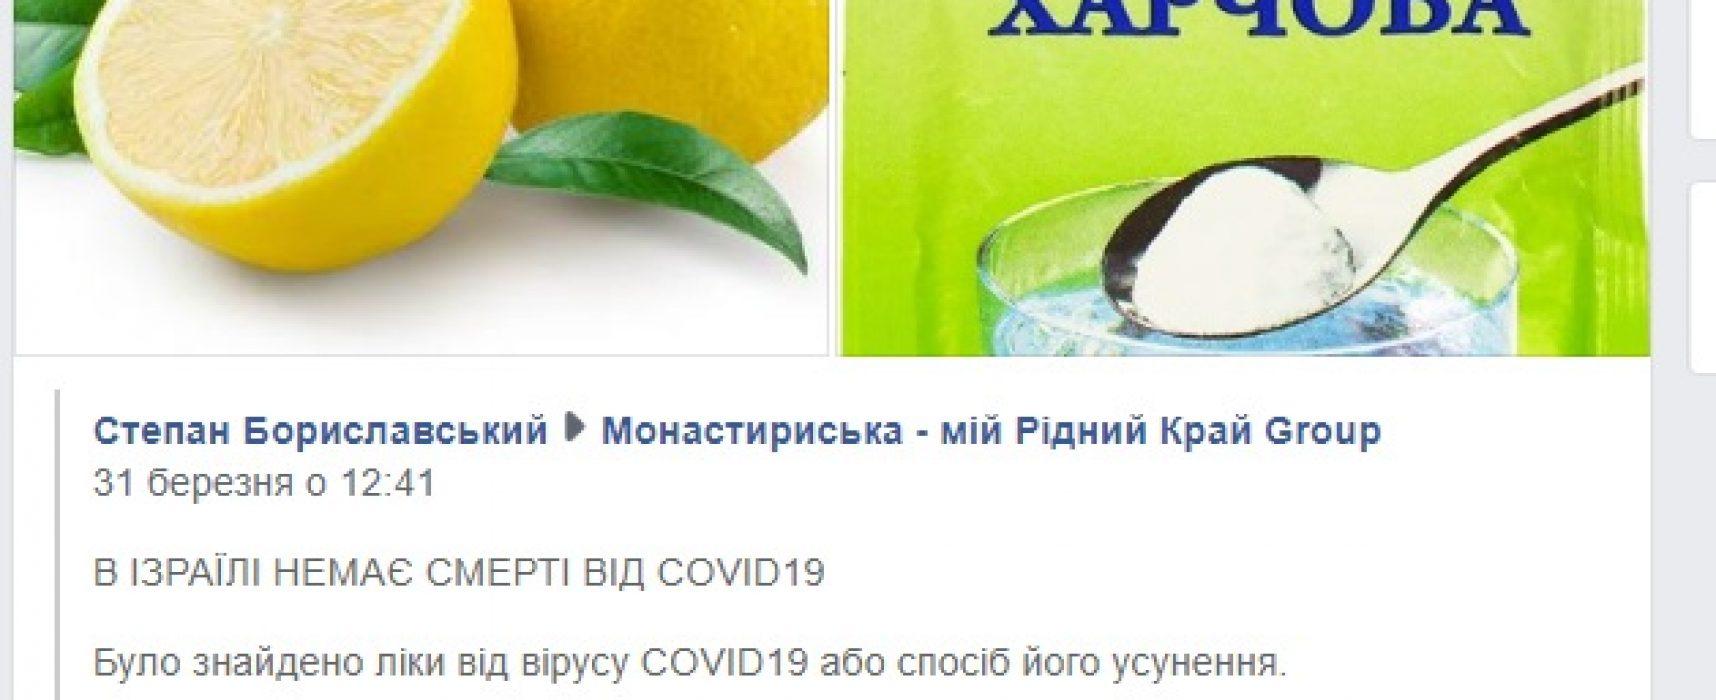 Фейк: Сода с лимоном лечит коронавирус